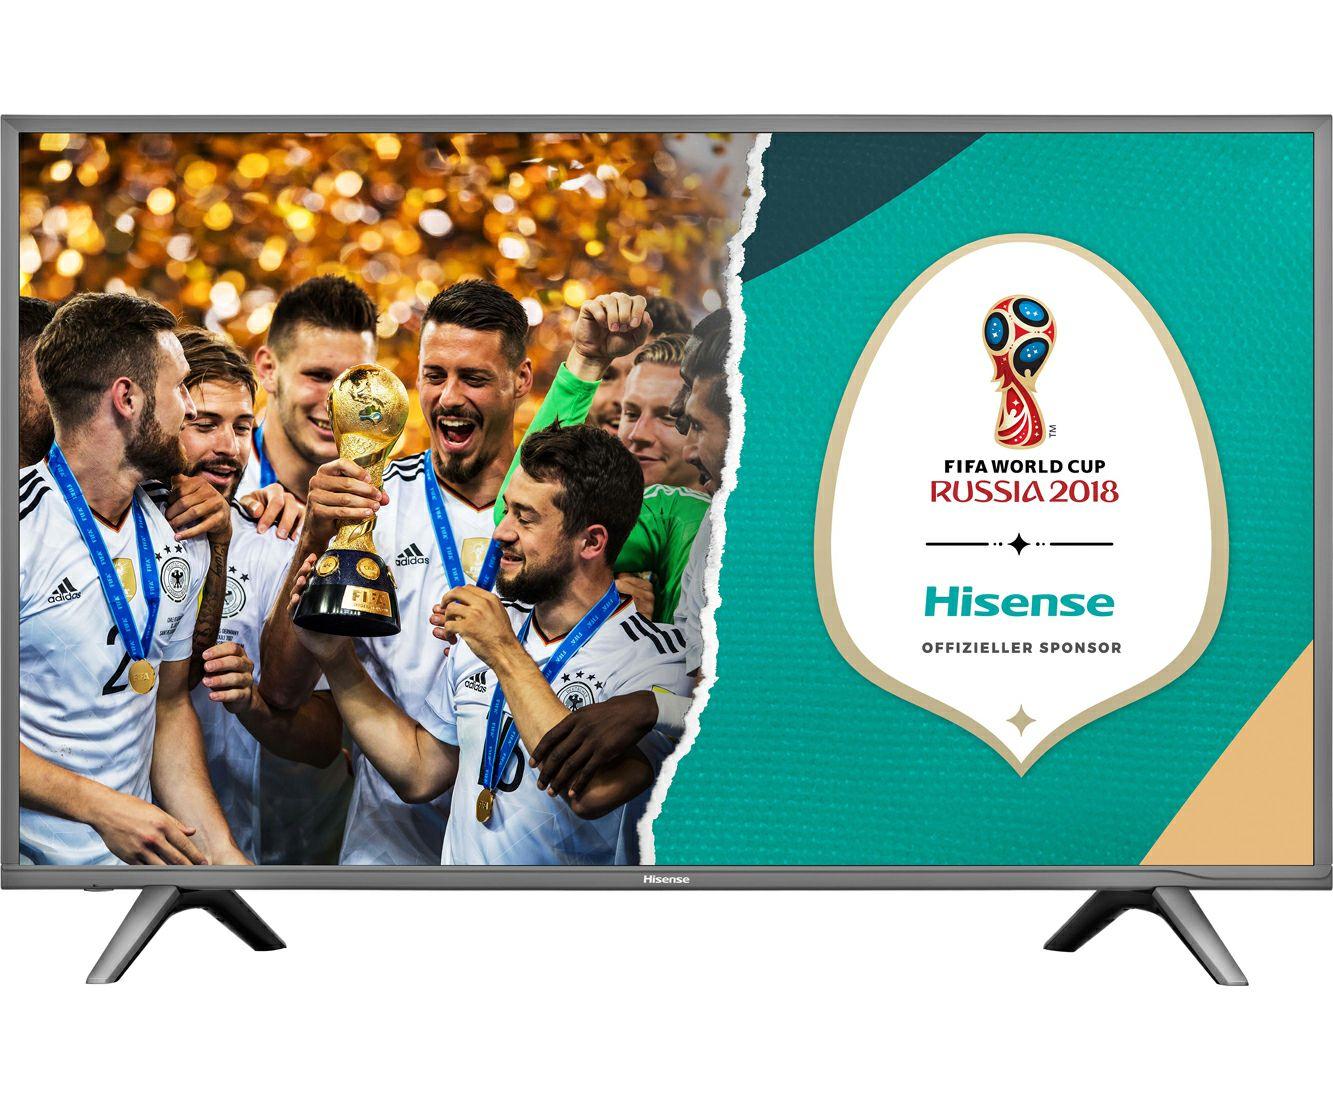 "Hisense H55NEC5605, 4K/UHD-Smart TV, 138 cm [55""] - Grau"